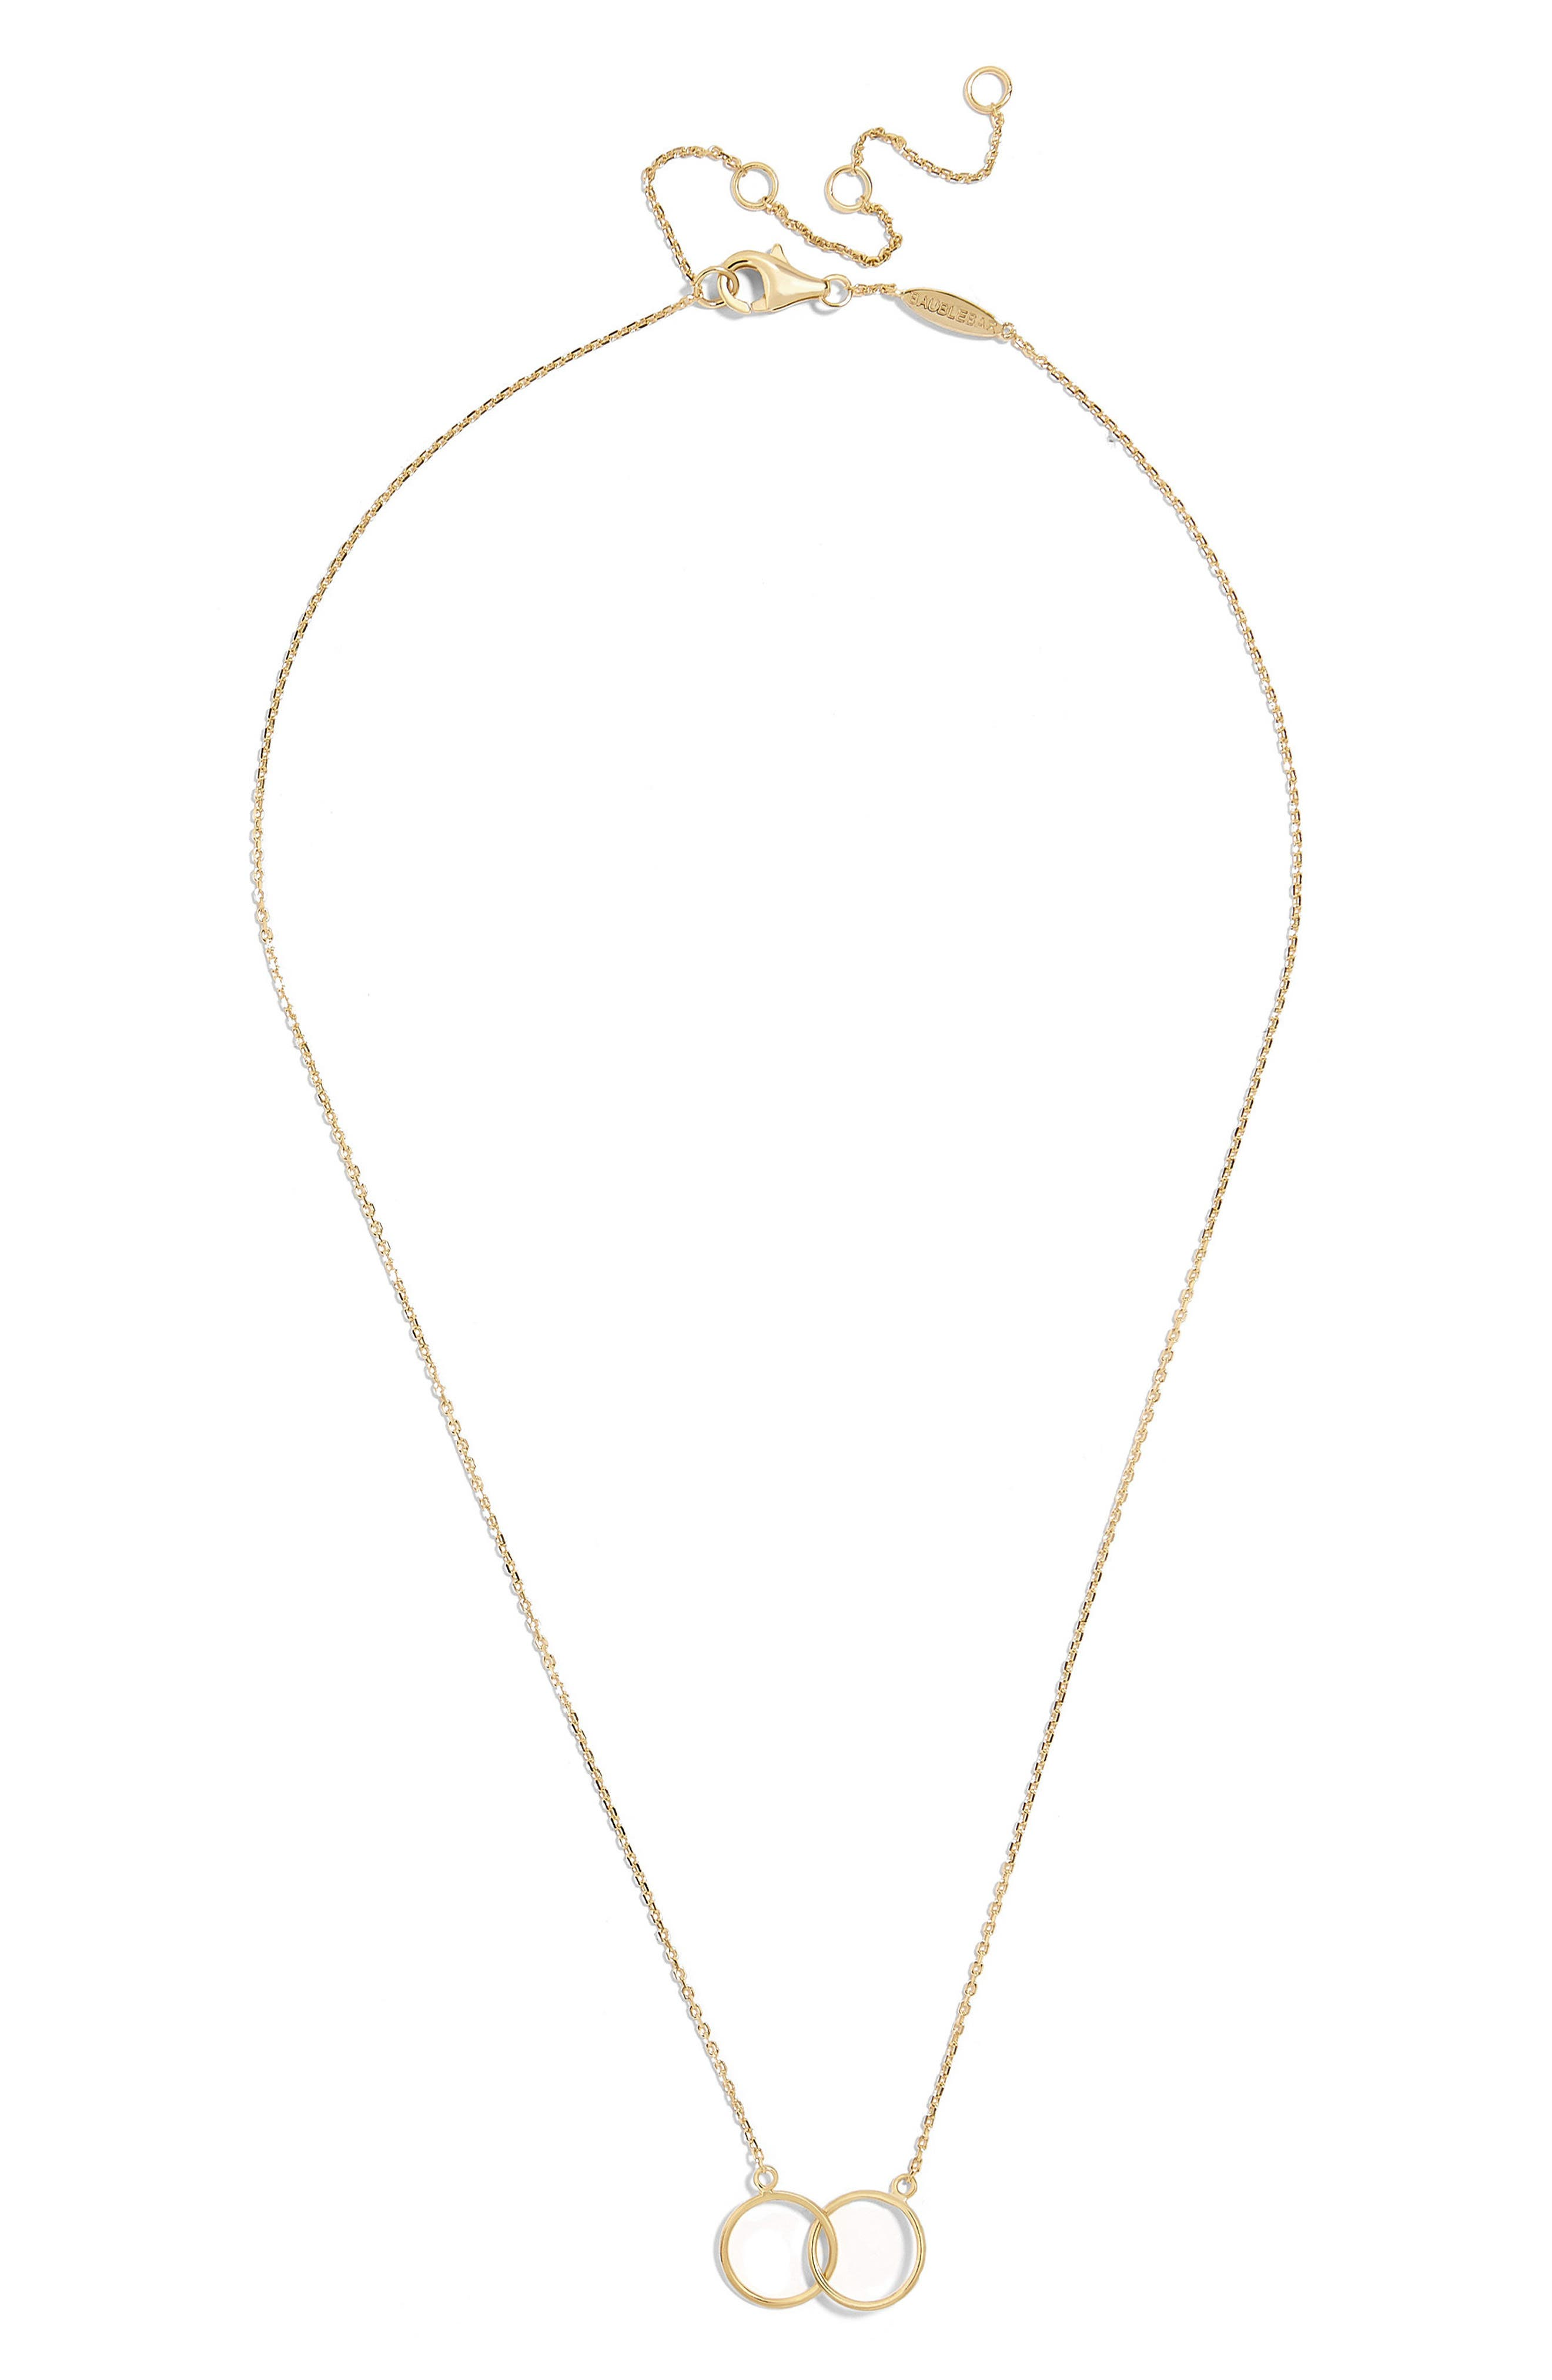 Connesso Everyday Fine Pendant Necklace,                             Main thumbnail 1, color,                             717